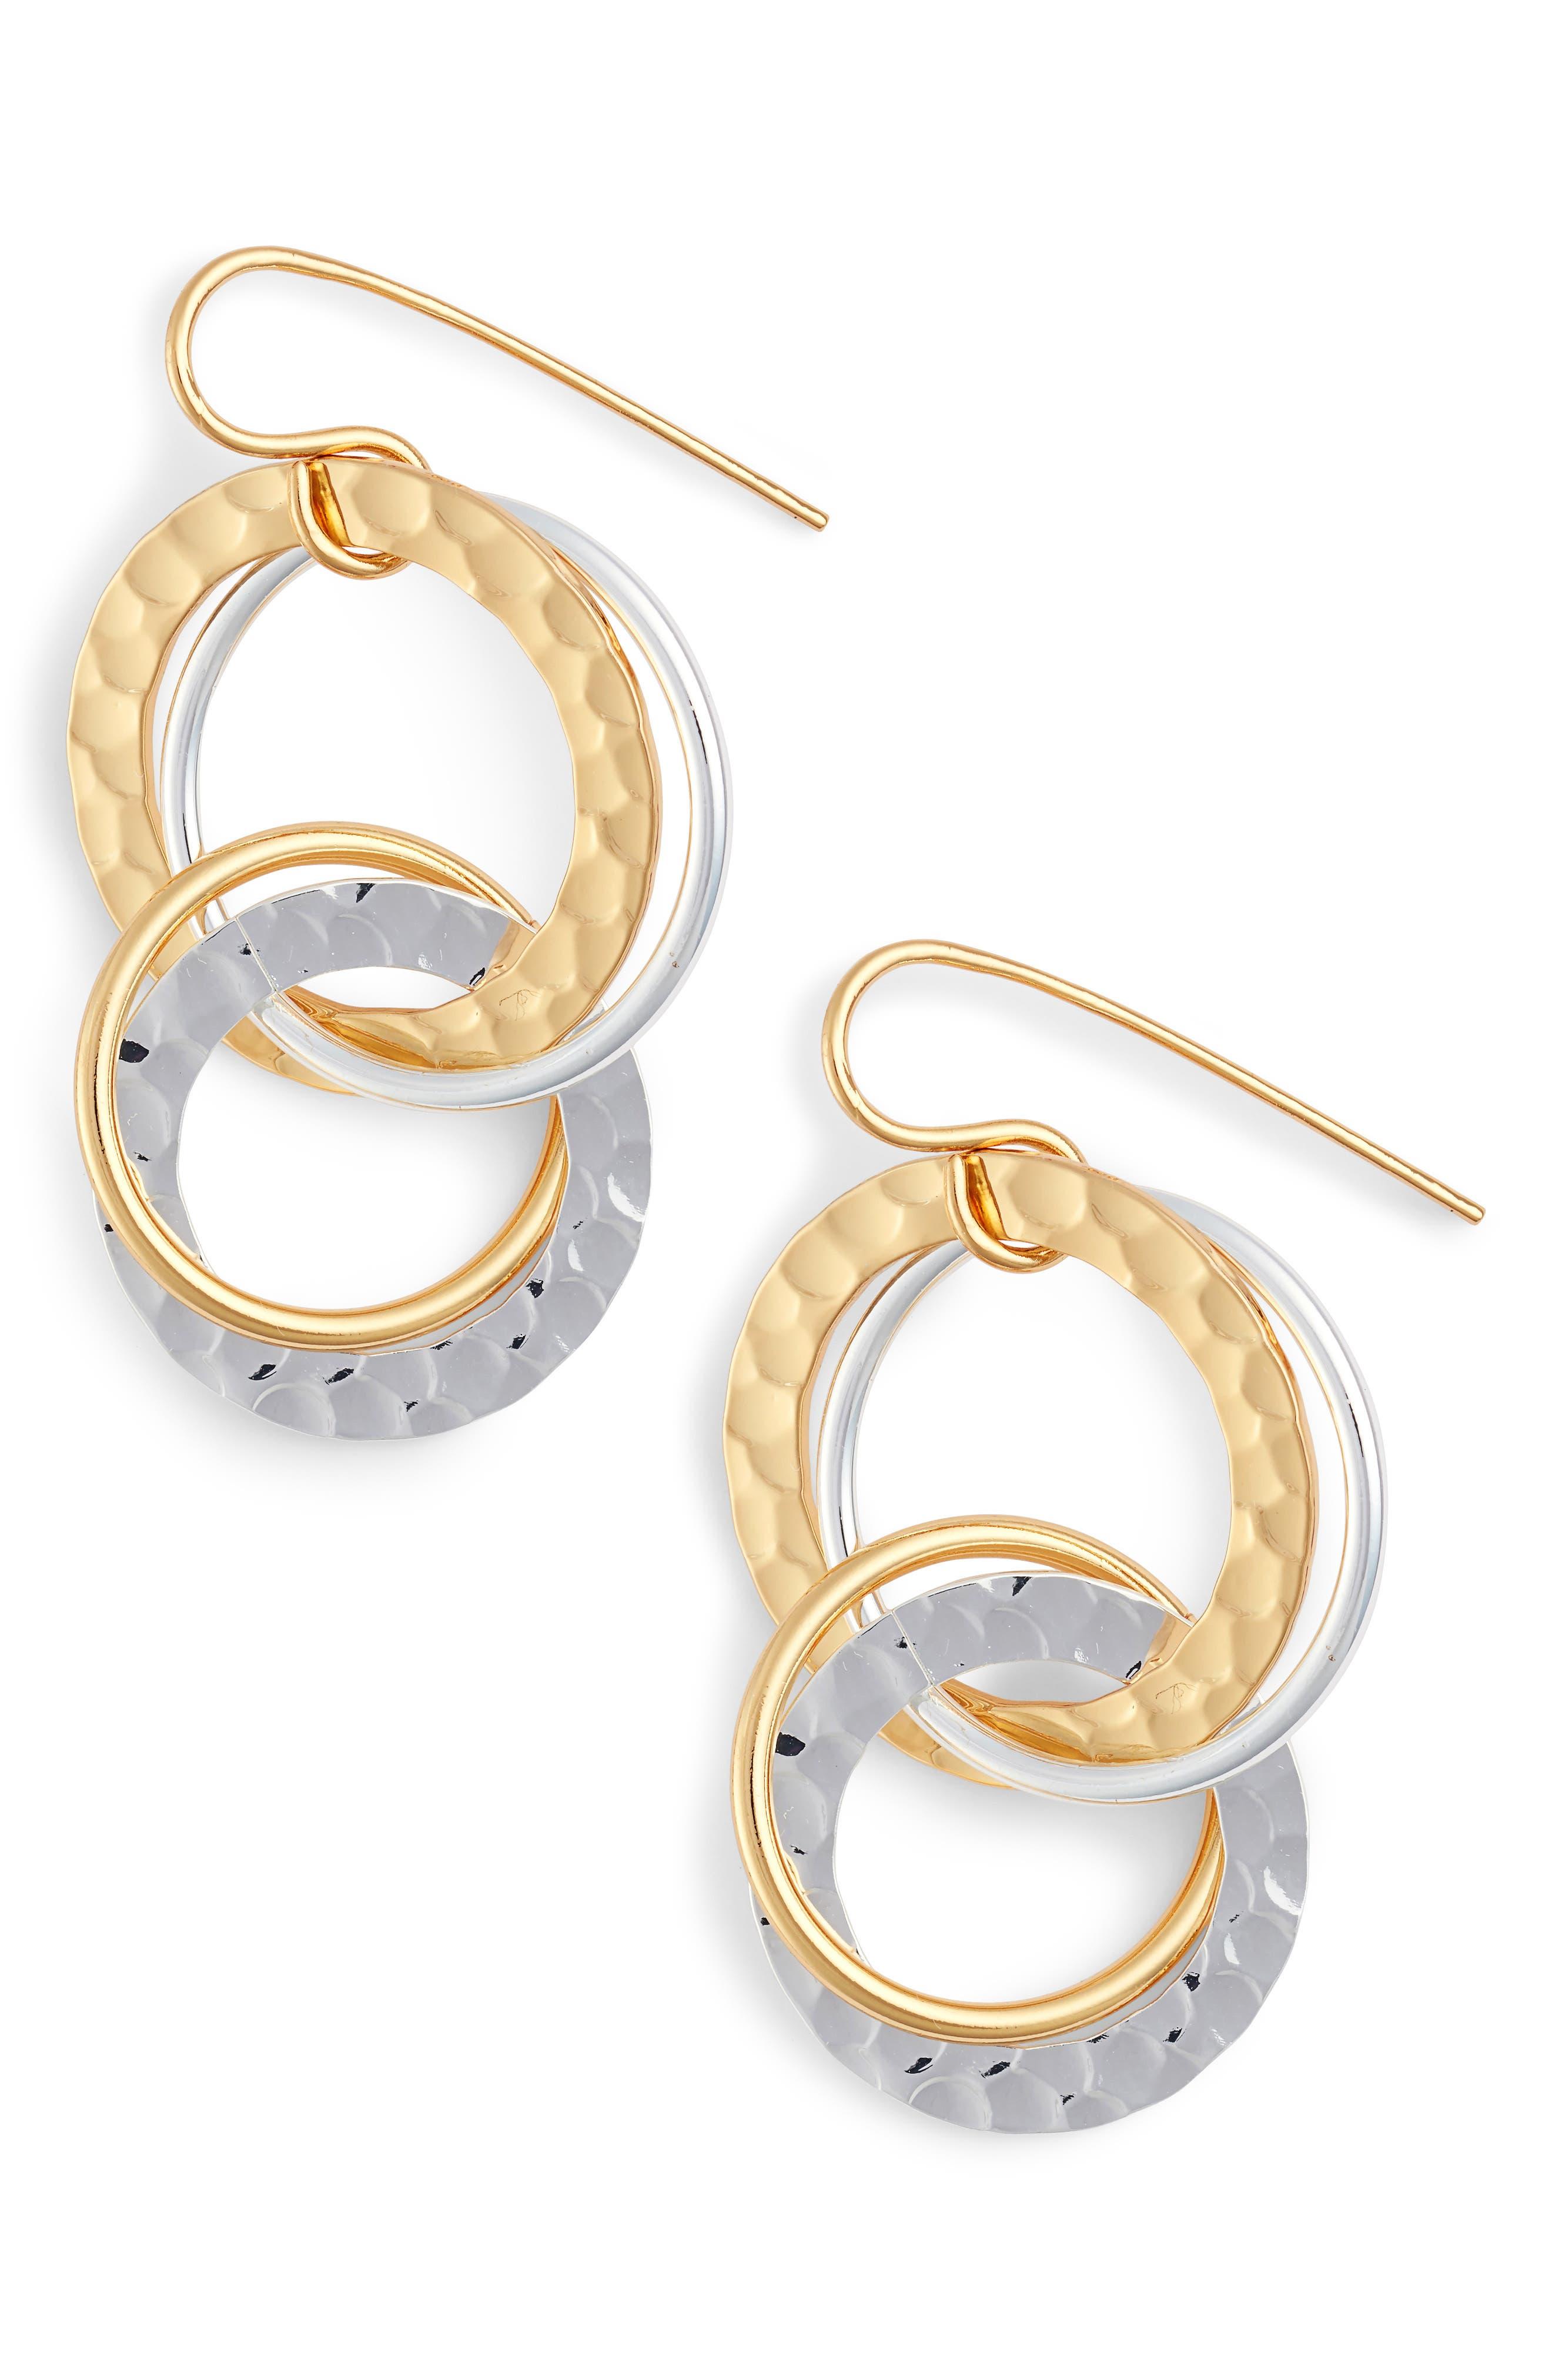 Multi Ring Earrings,                             Main thumbnail 1, color,                             710